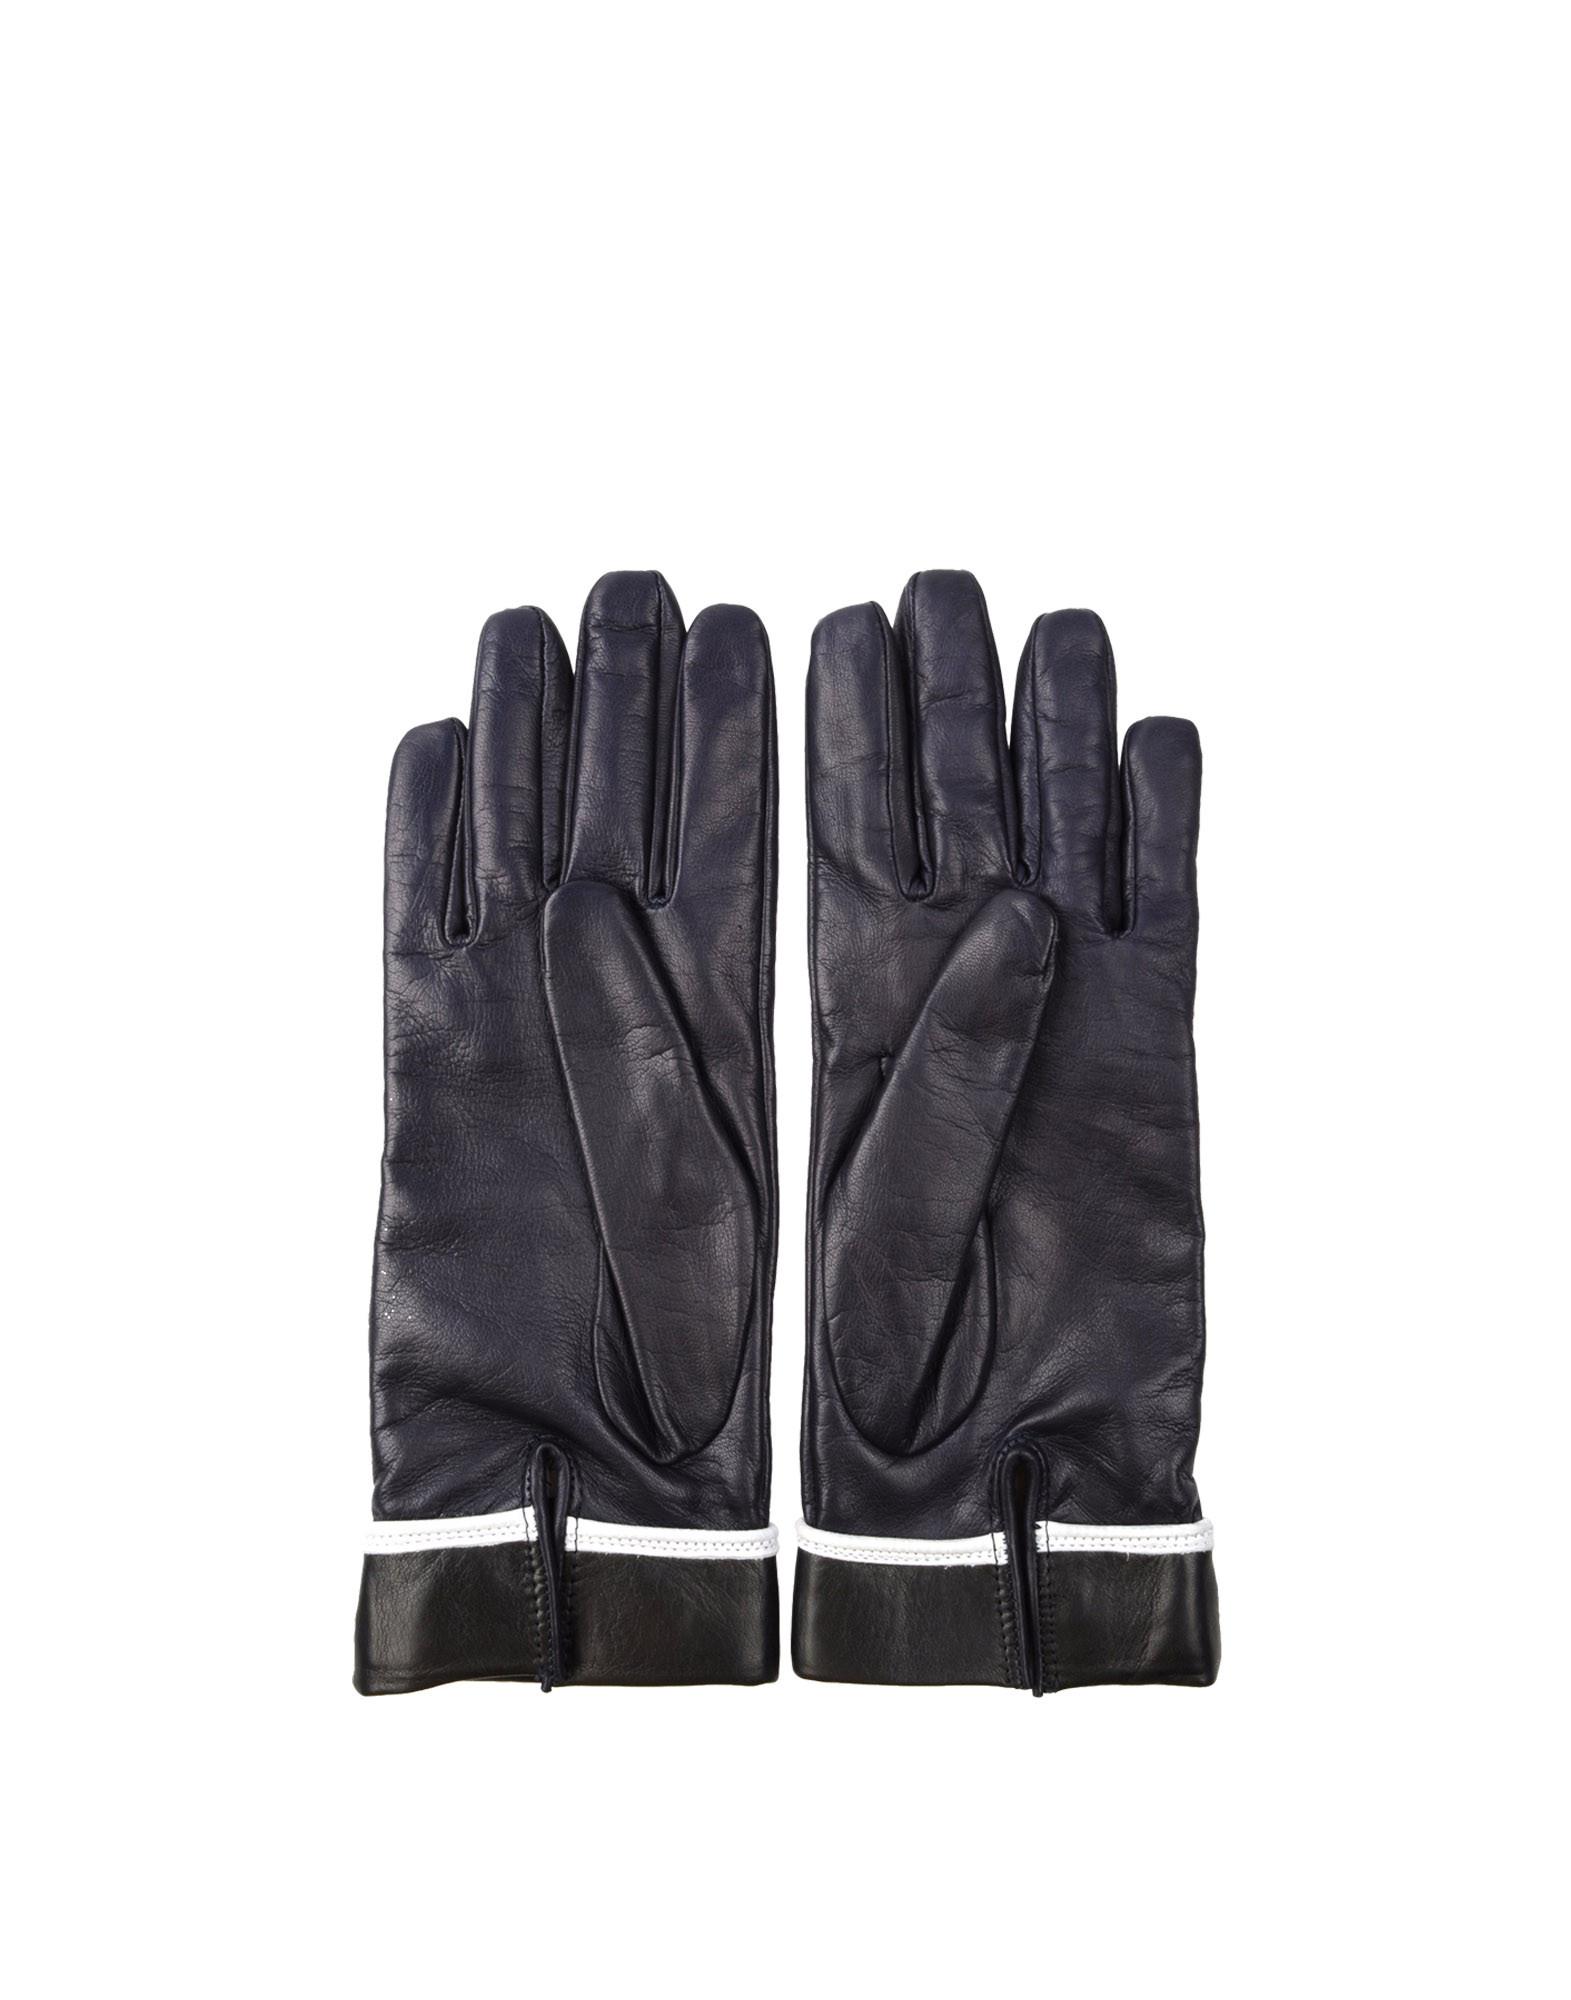 Gloves - JIL SANDER NAVY Online Store